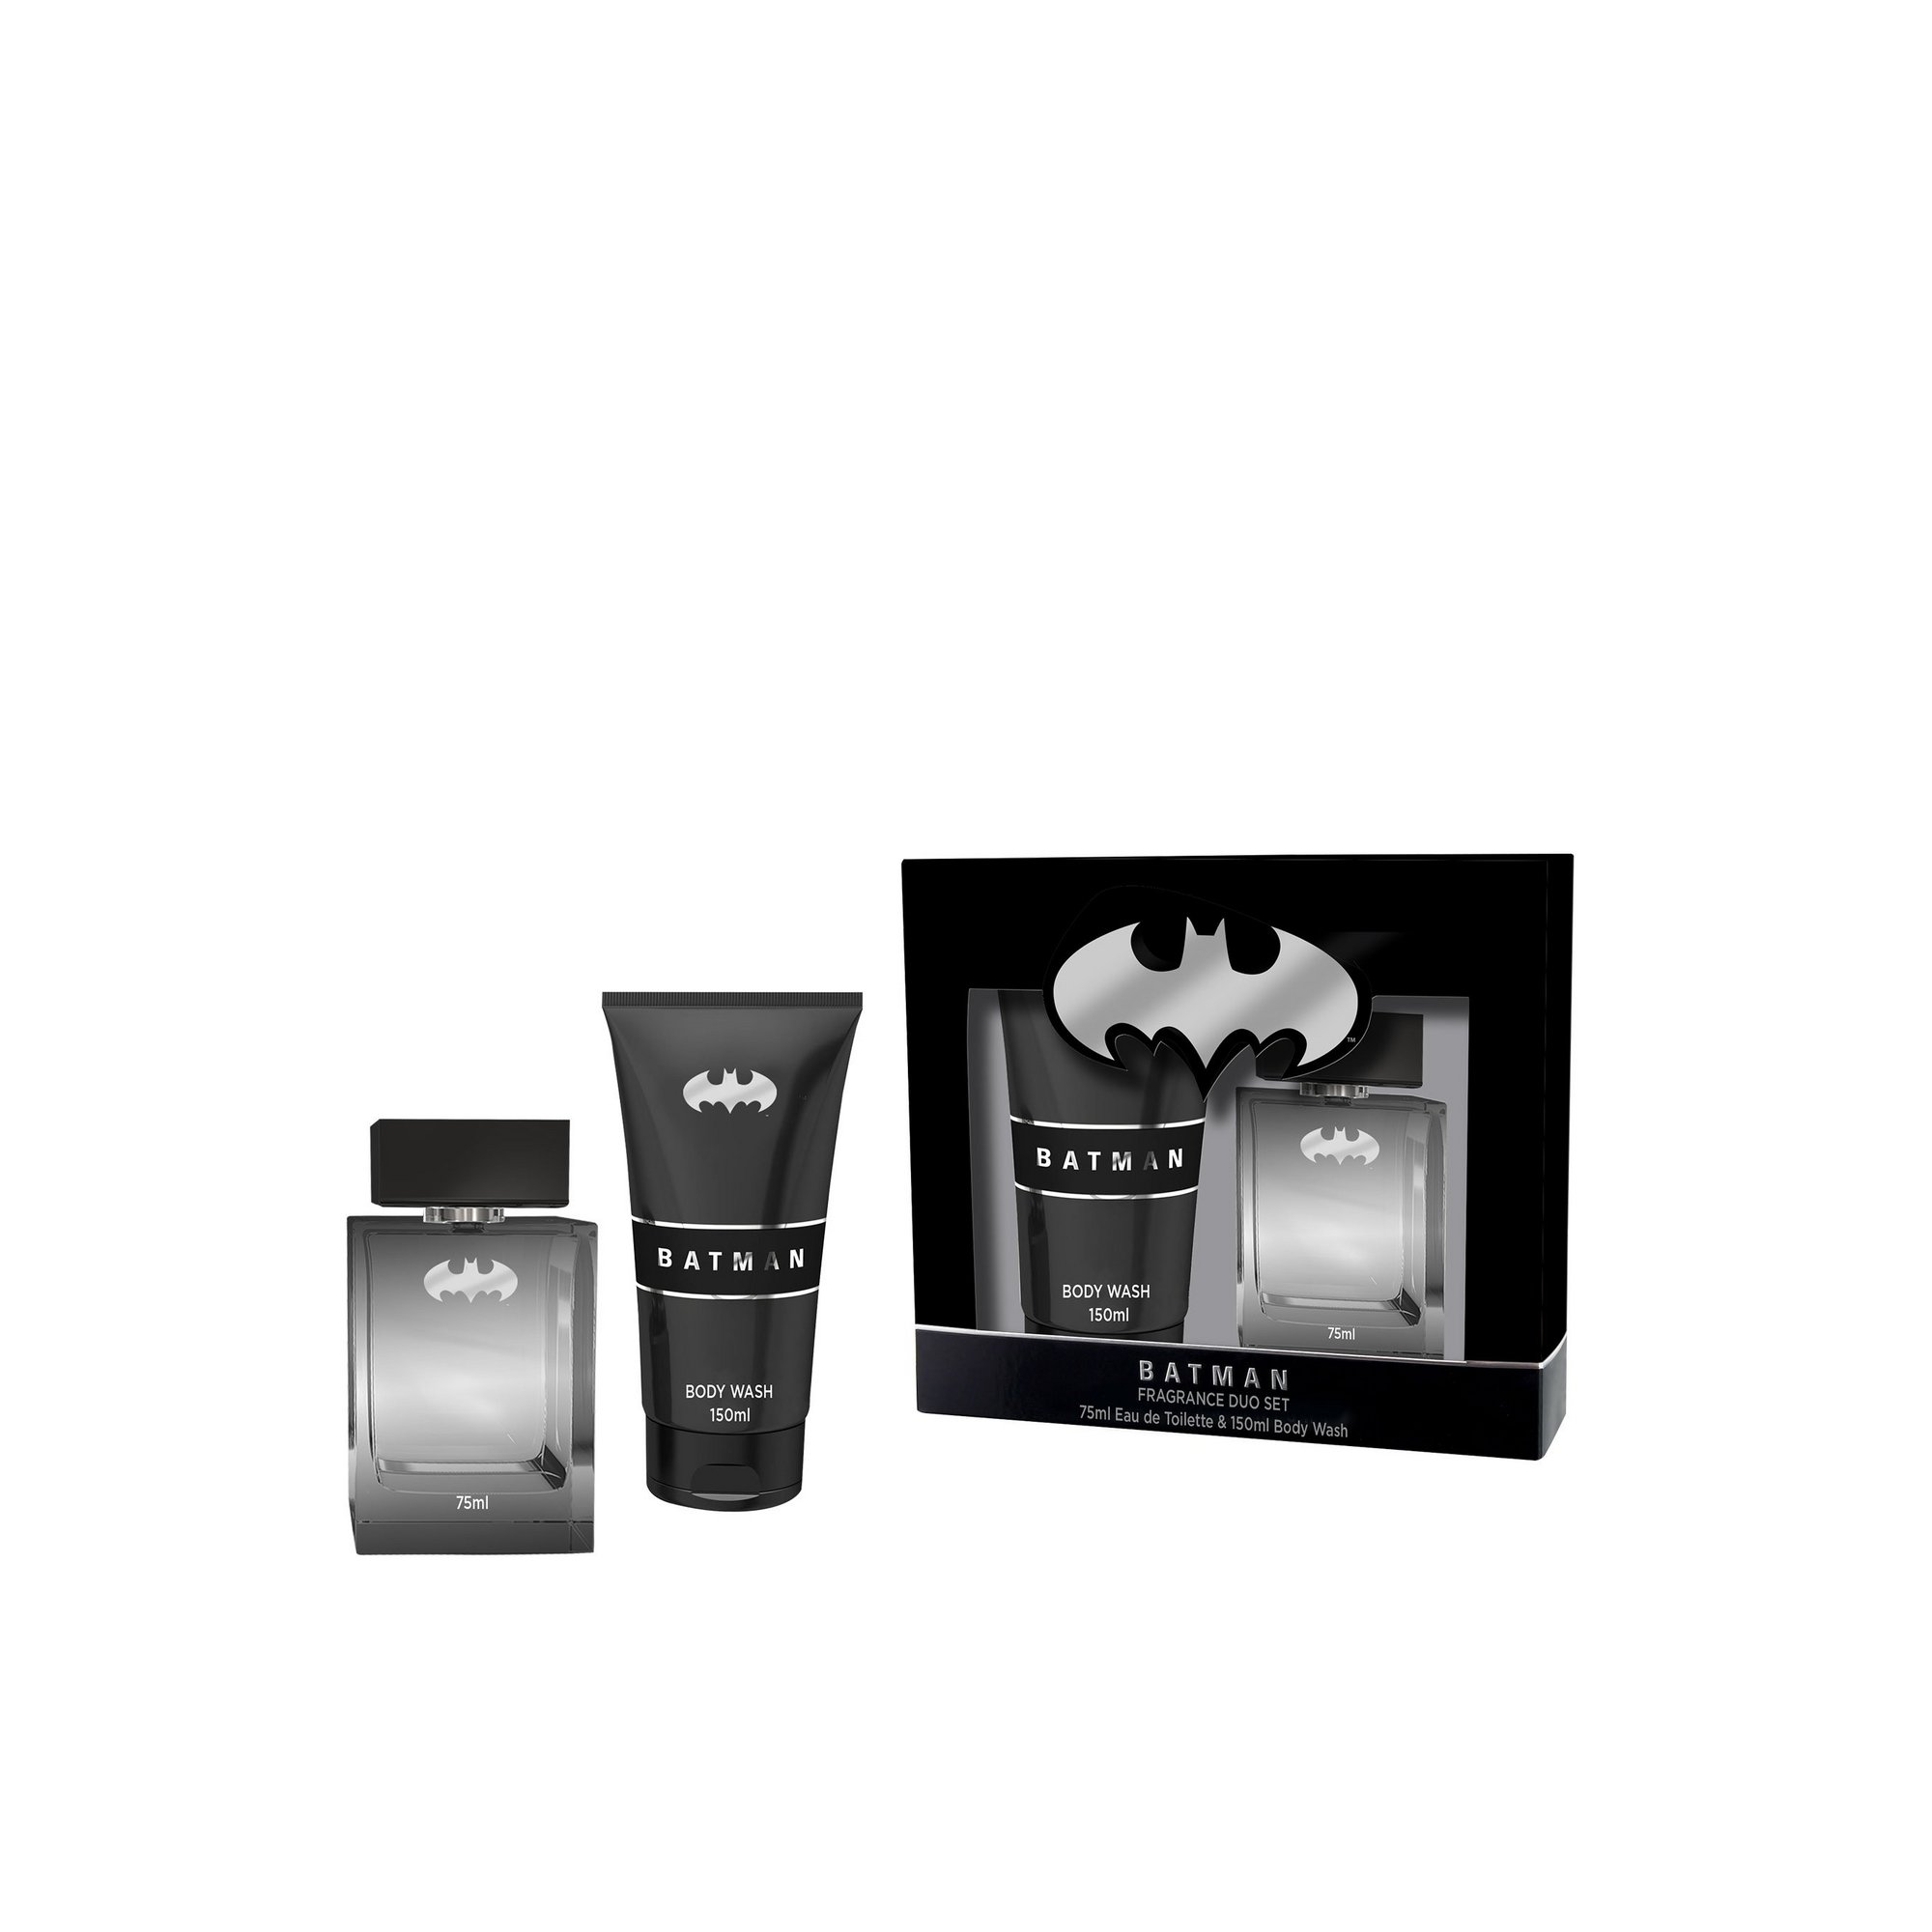 Image of Batman Fragrance Duo Gift Set